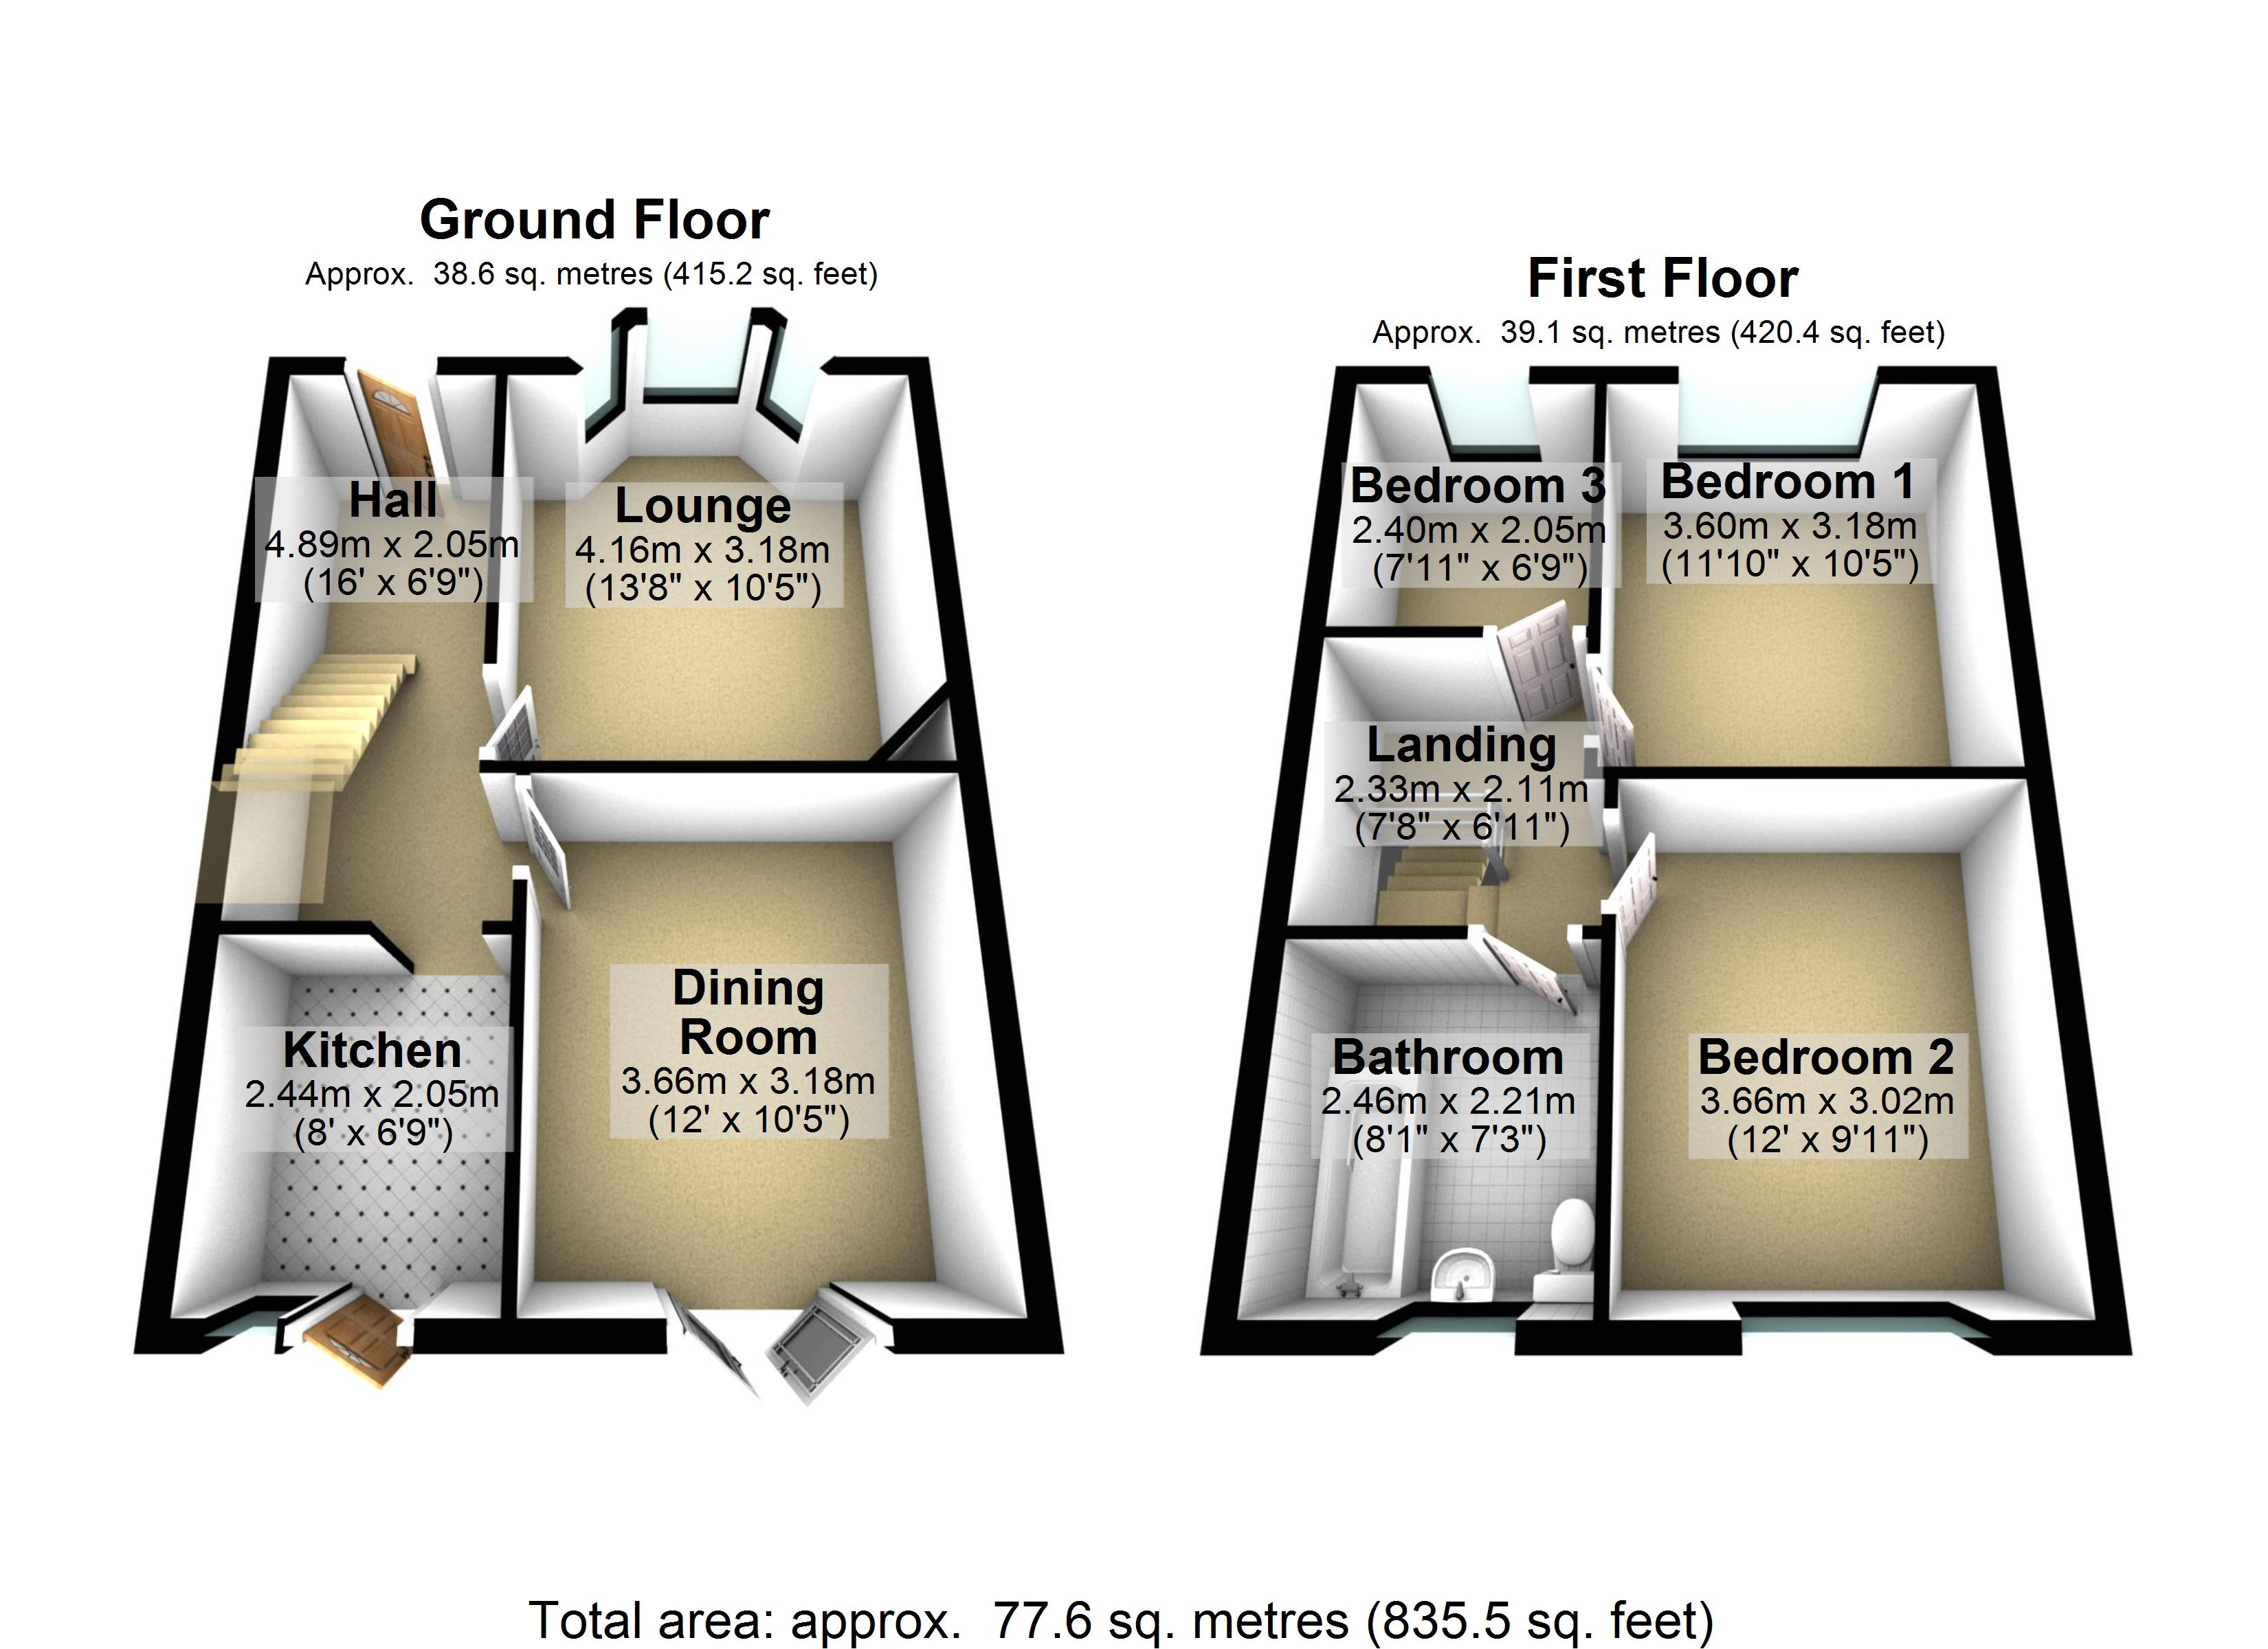 The House Photographer - Property Photography - Floorplan in 3D Property Floor Plans Estate Agents Floor Plans